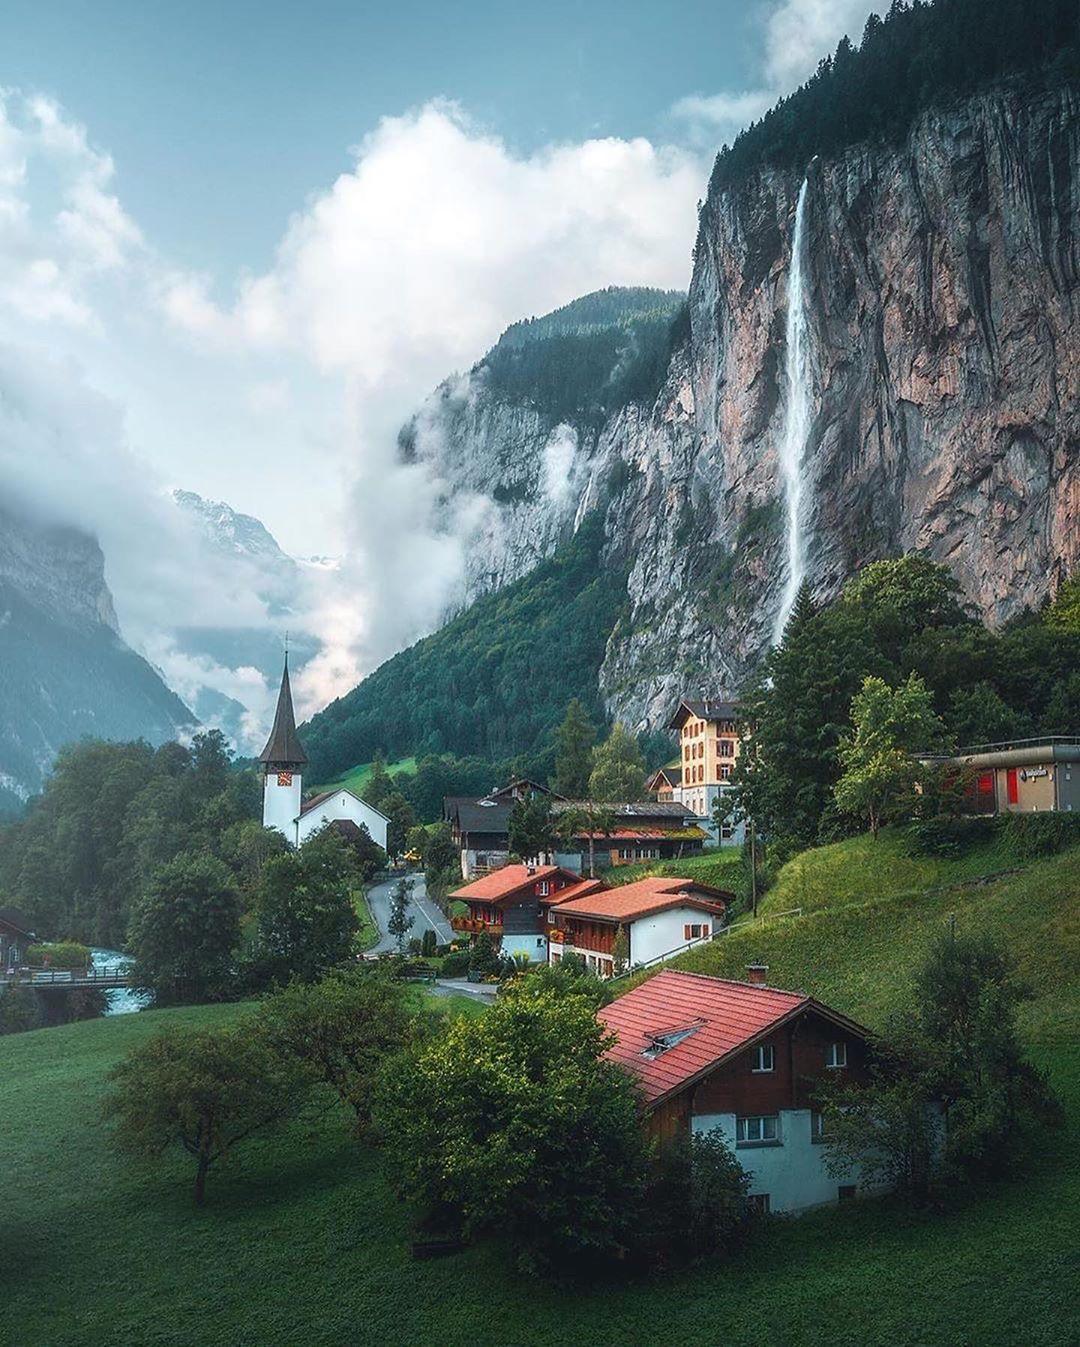 6415321bfb3d4d4e9363c7a05f2f7063?from=pc - 瑞士:一个童话般的国家